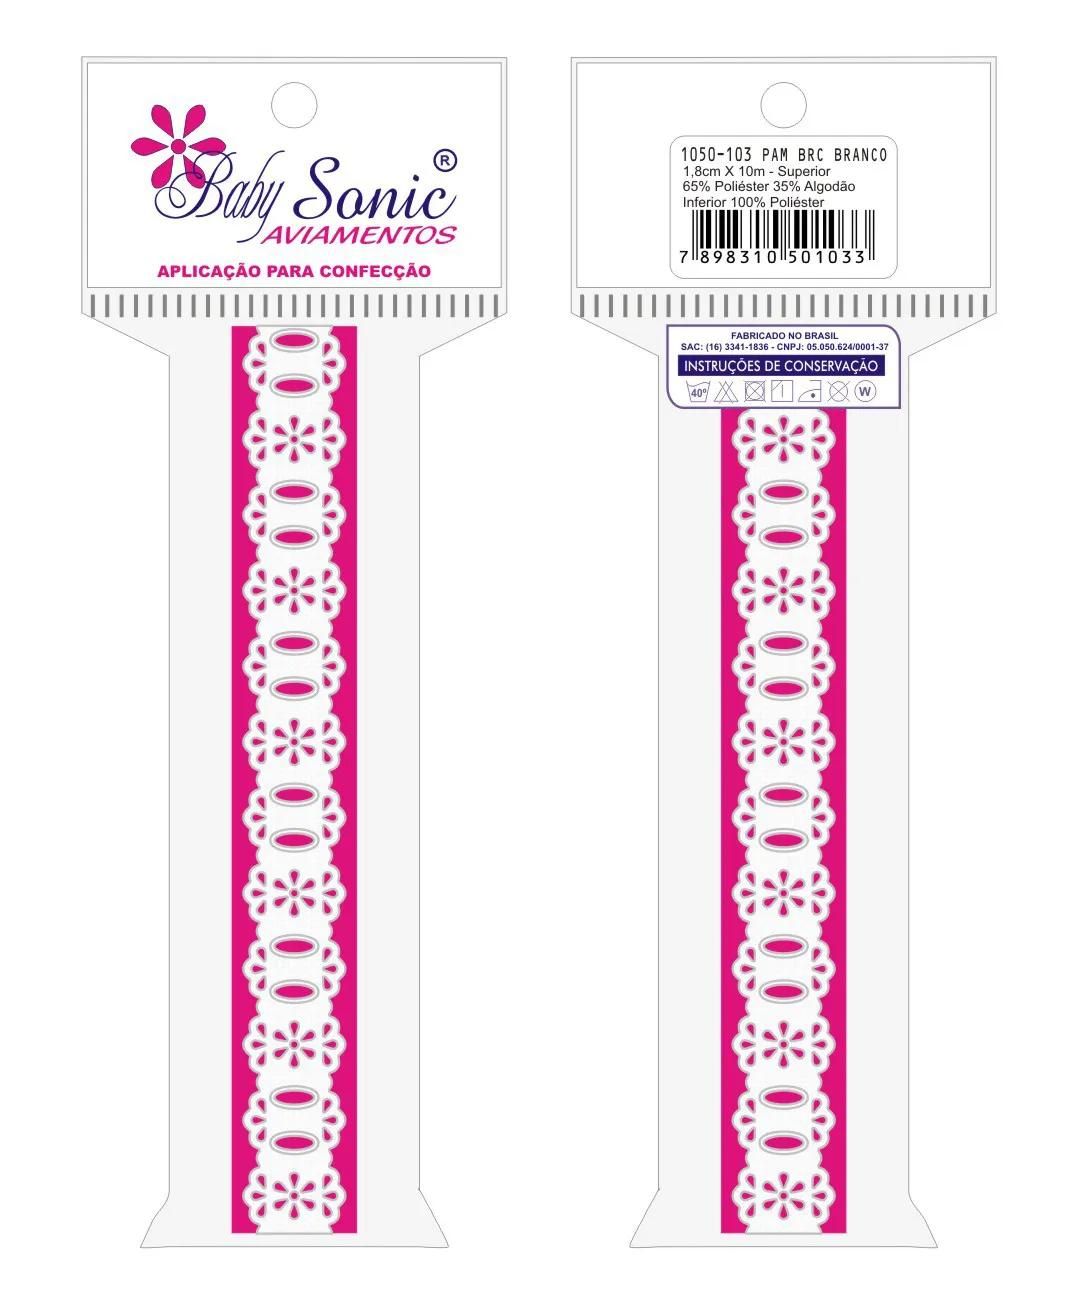 1050 Passa Fita 1,8cm X 10m  - Baby Sonic Aviamentos